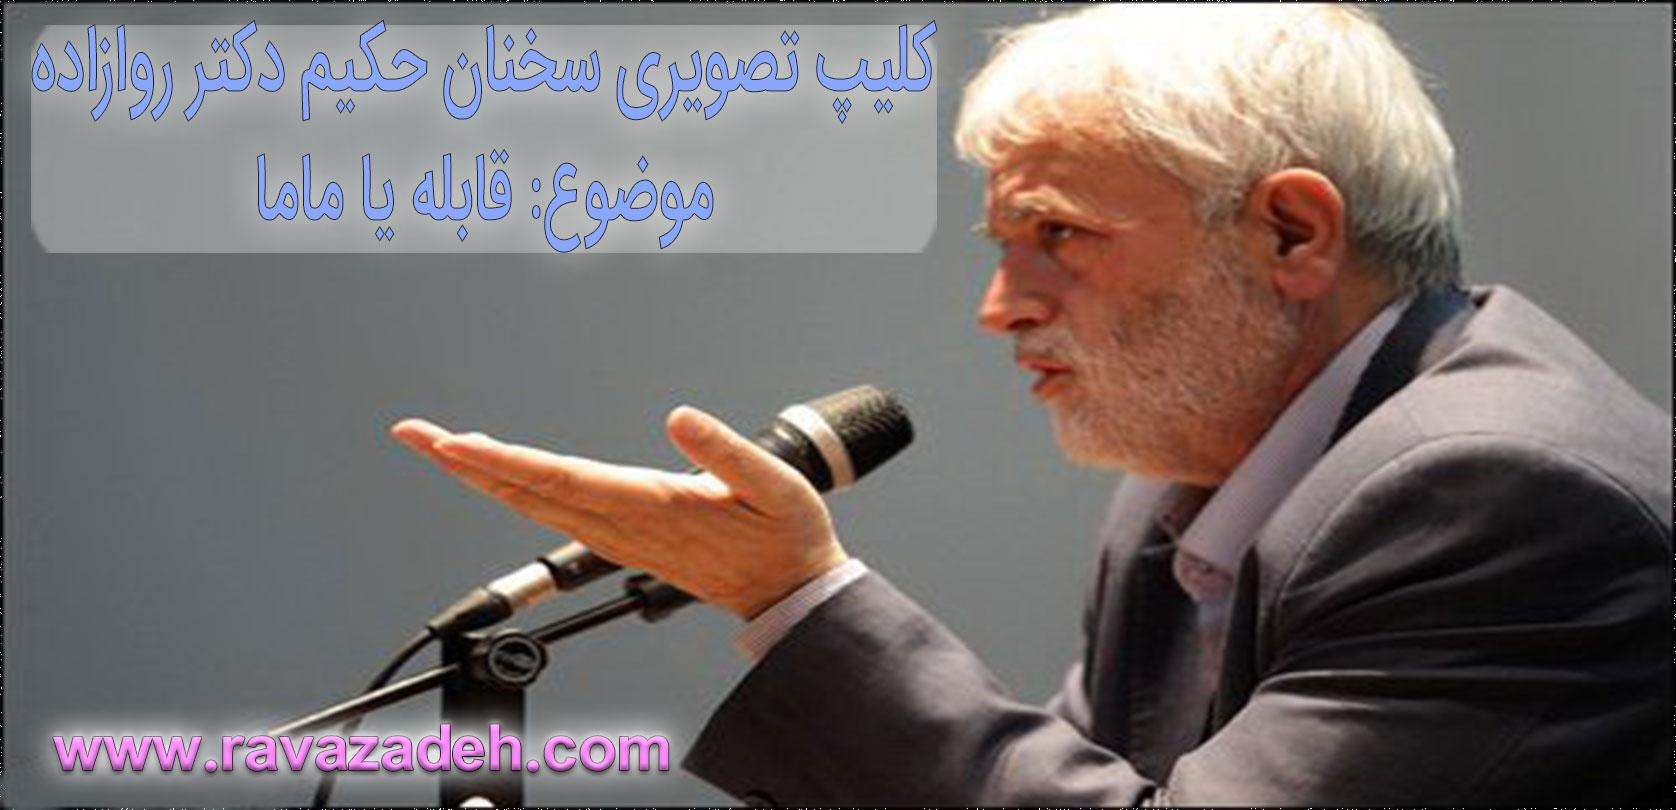 Photo of قابله یا ماما + کلیپ تصویری سخنرانی حکیم دکتر روازاده